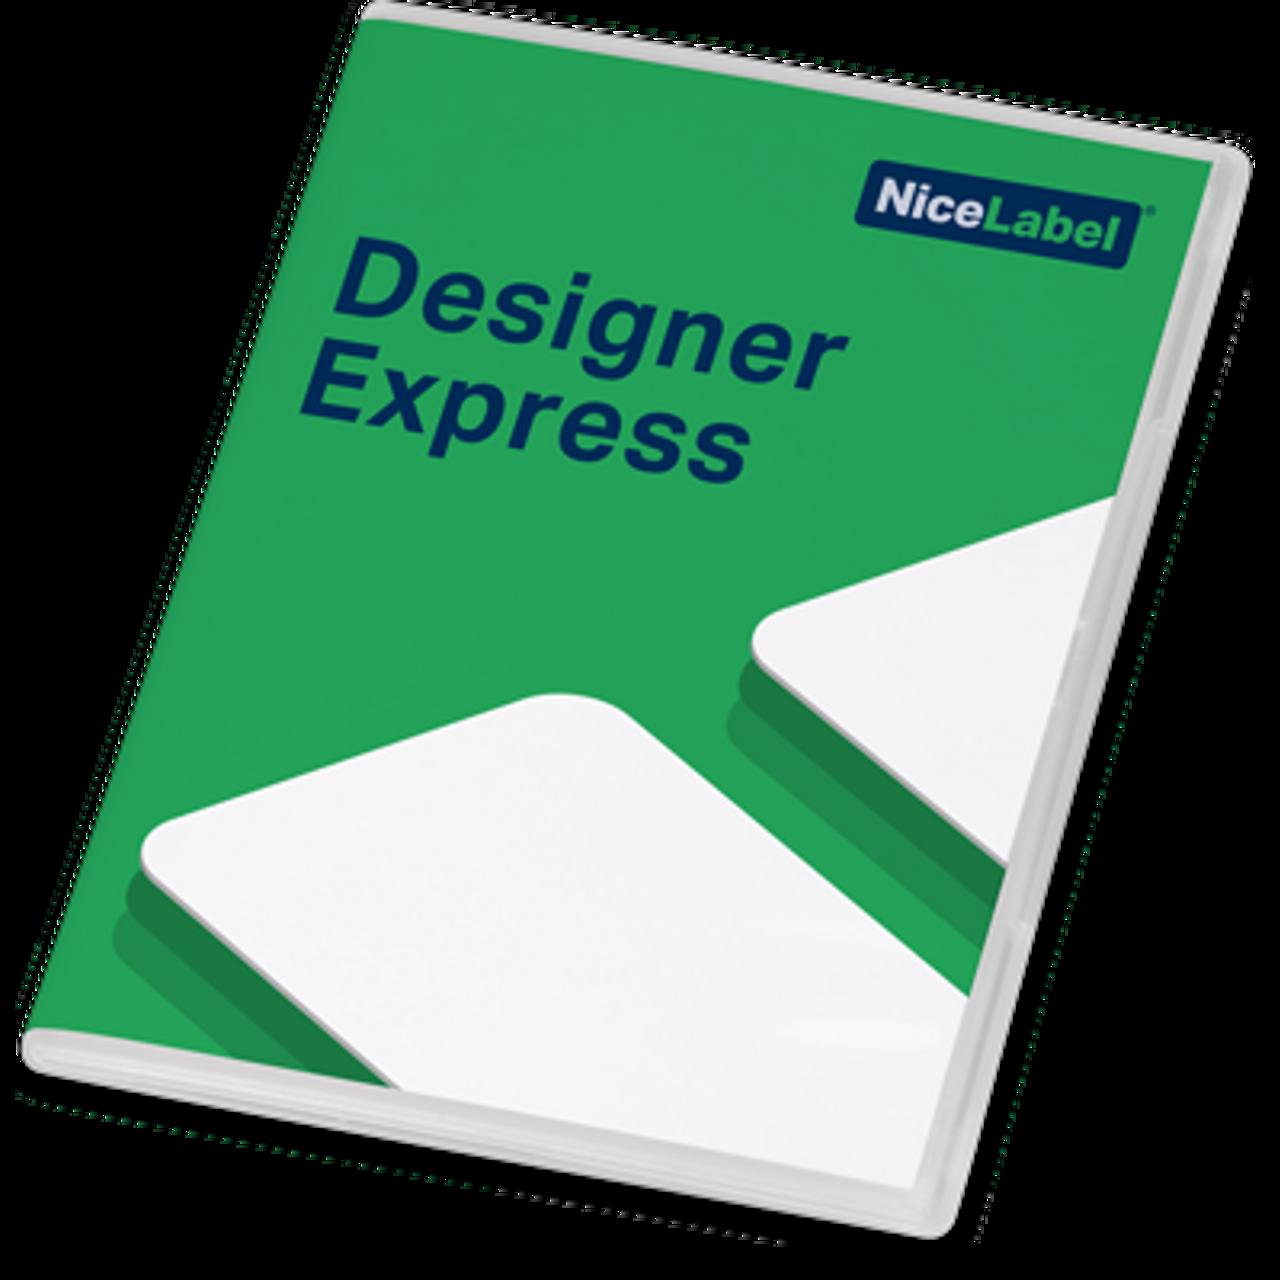 NiceLabel 2017 Designer Express (NLDEXX001S)